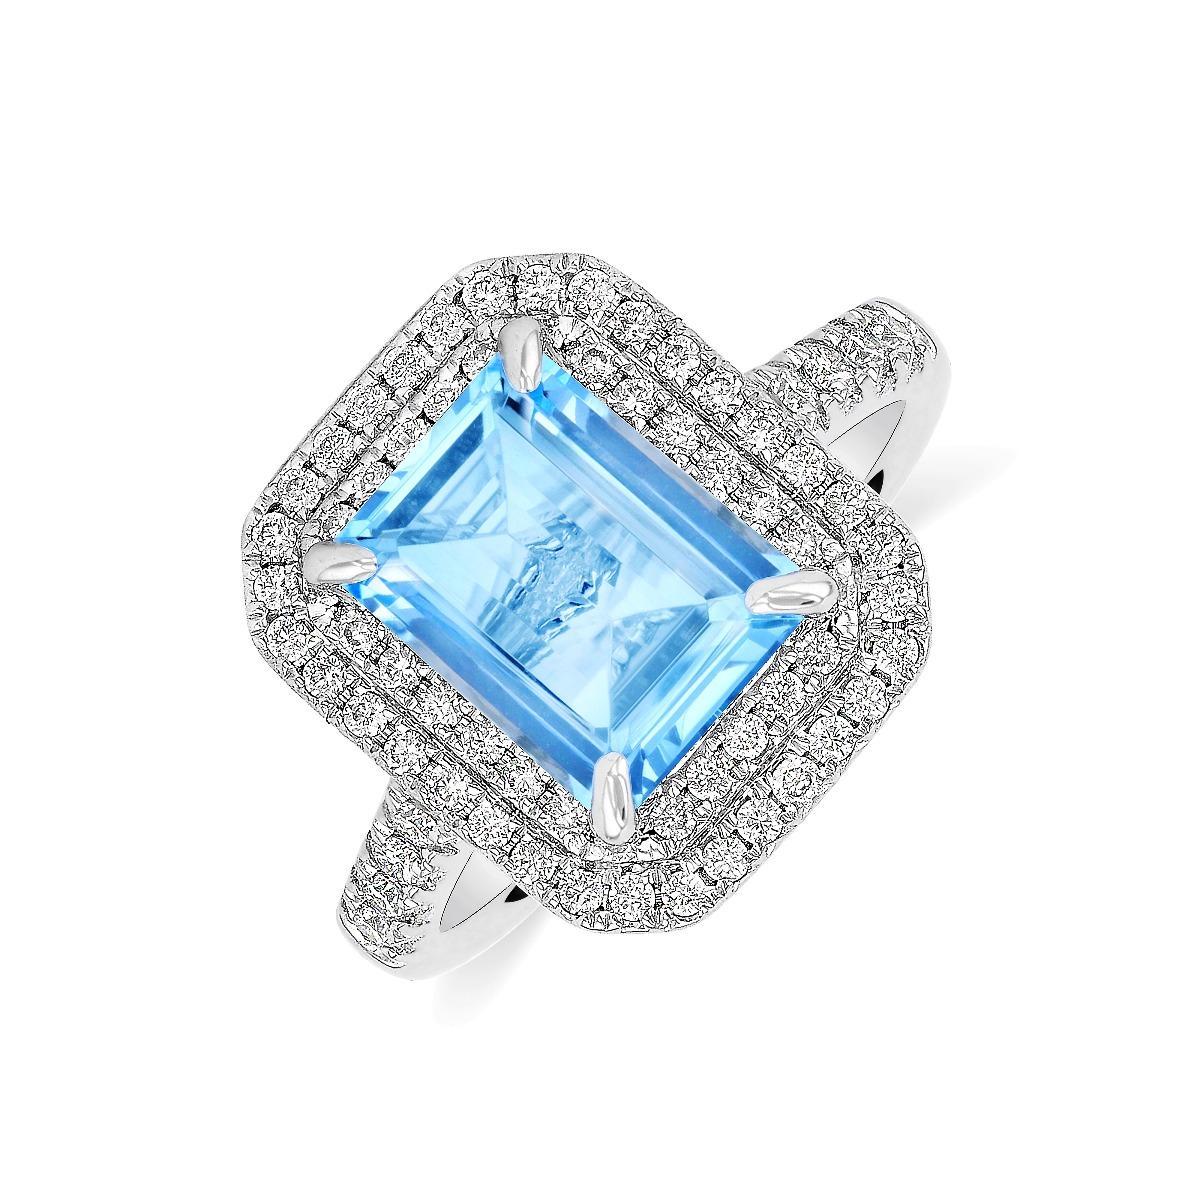 Riviera Collection 2.40ct Aquamarine & Diamond Double Halo Ring | 18K White Gold